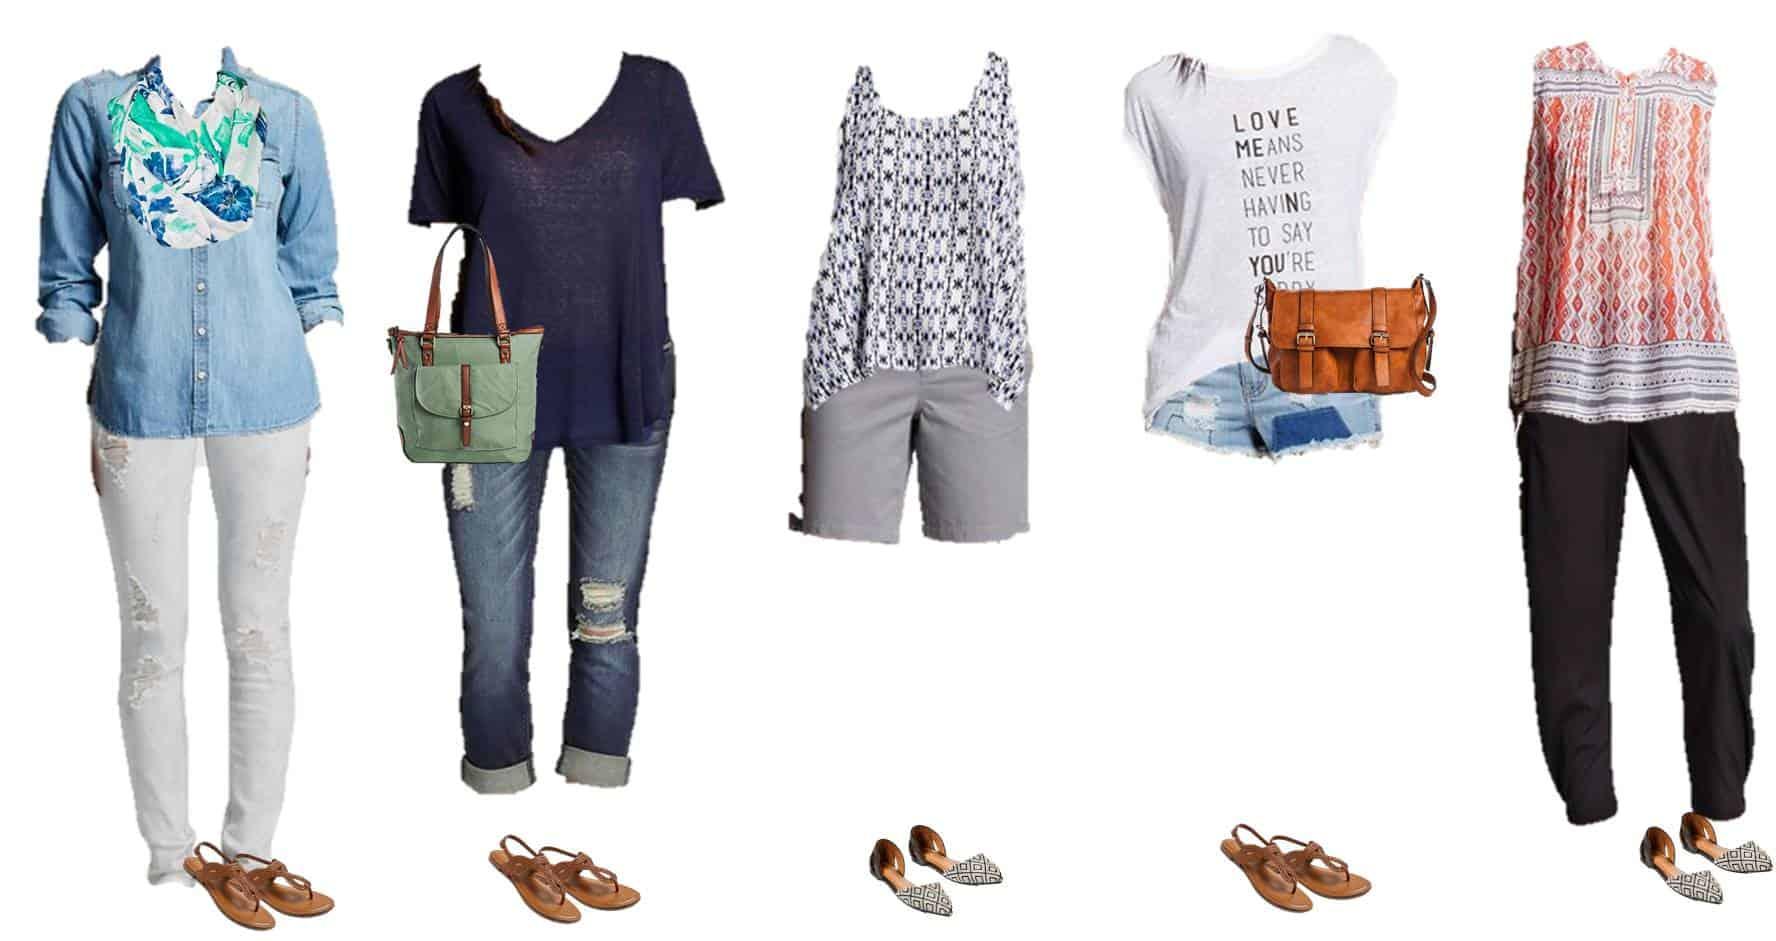 4.14 Mix & Match Fashion - Target Summer Styles 1-5